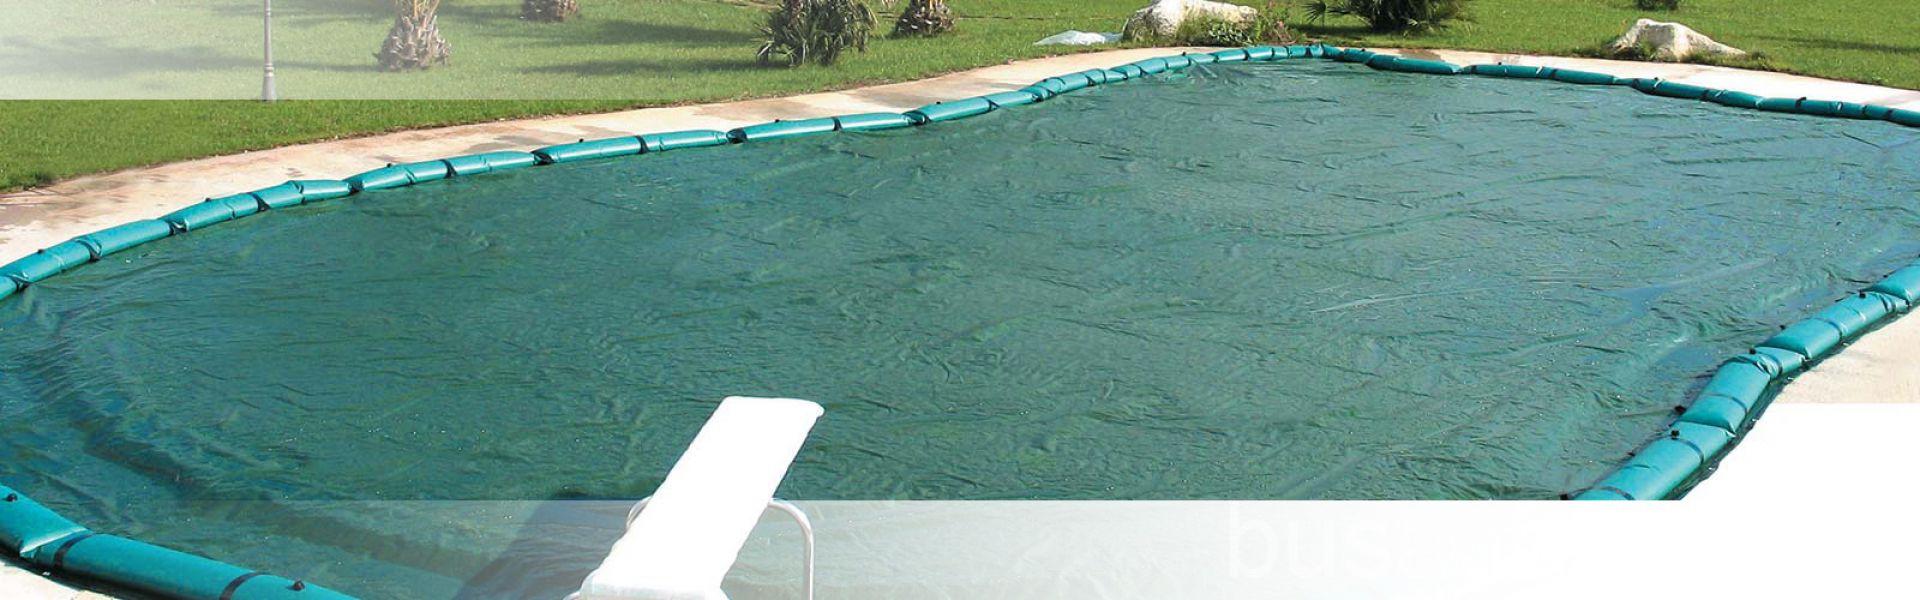 abdeckungen swimming pool poolabdeckungen in k rnten. Black Bedroom Furniture Sets. Home Design Ideas